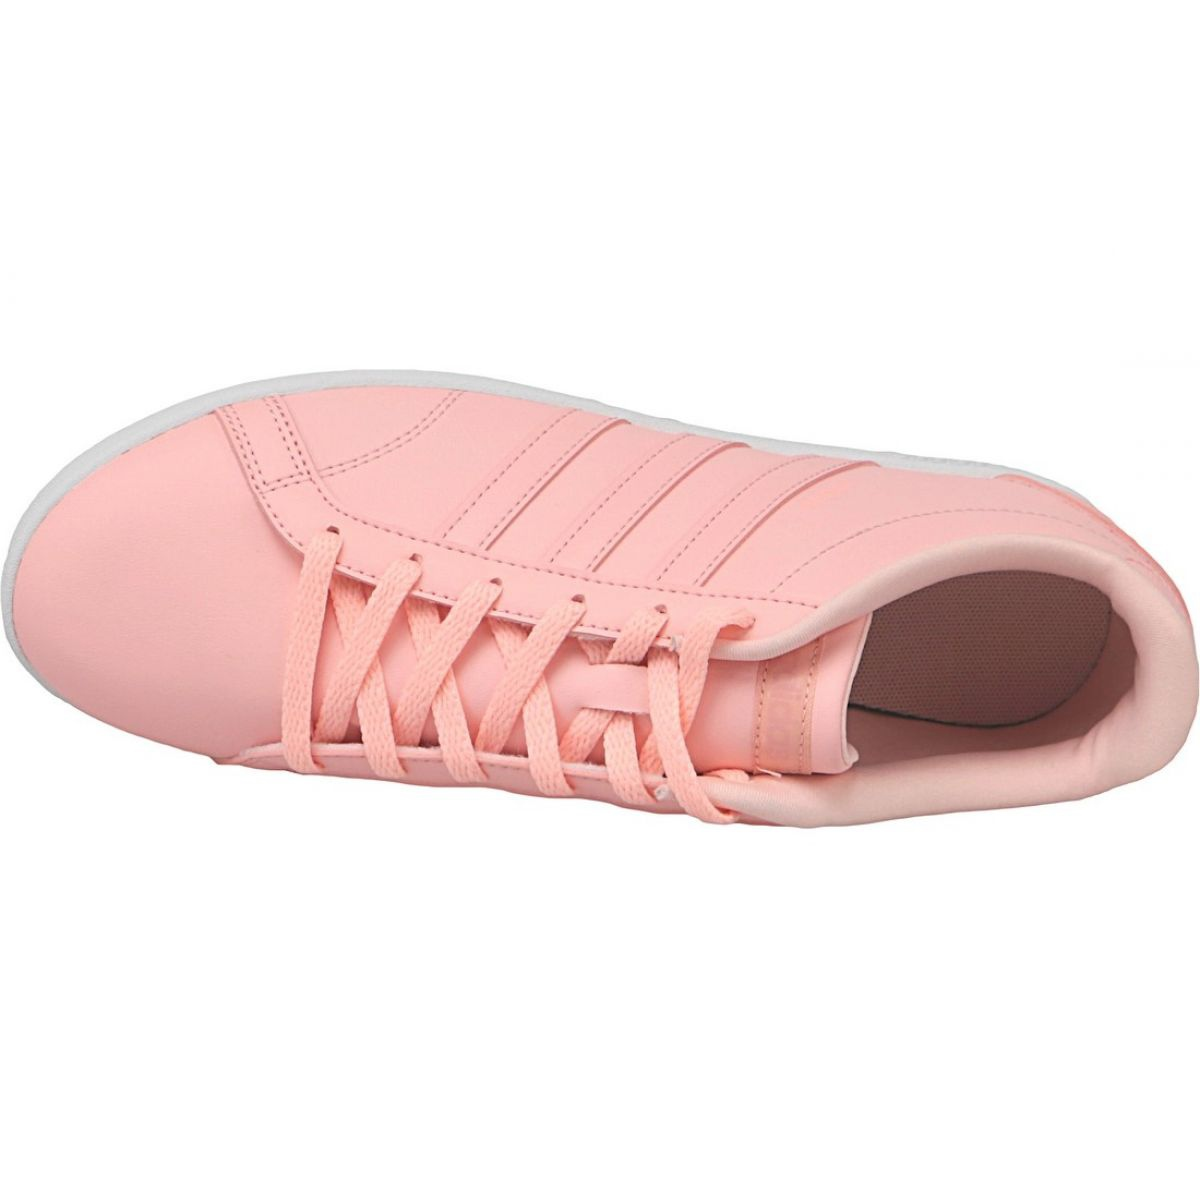 Pink Adidas Vs Coneo Qt Schuhe in B74554